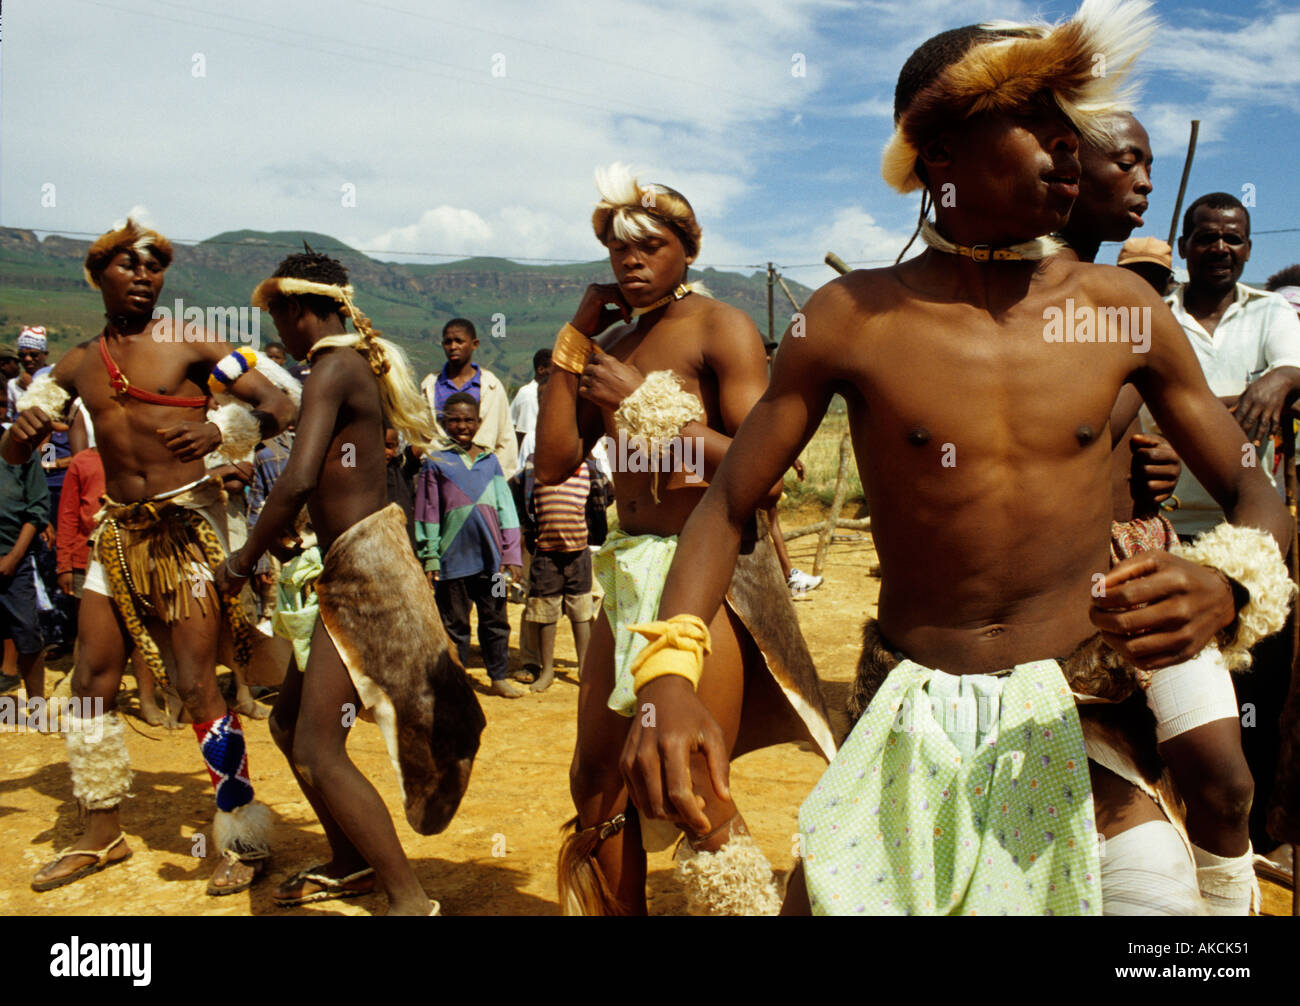 Women nude traditional zulu pussy pics pornstar some